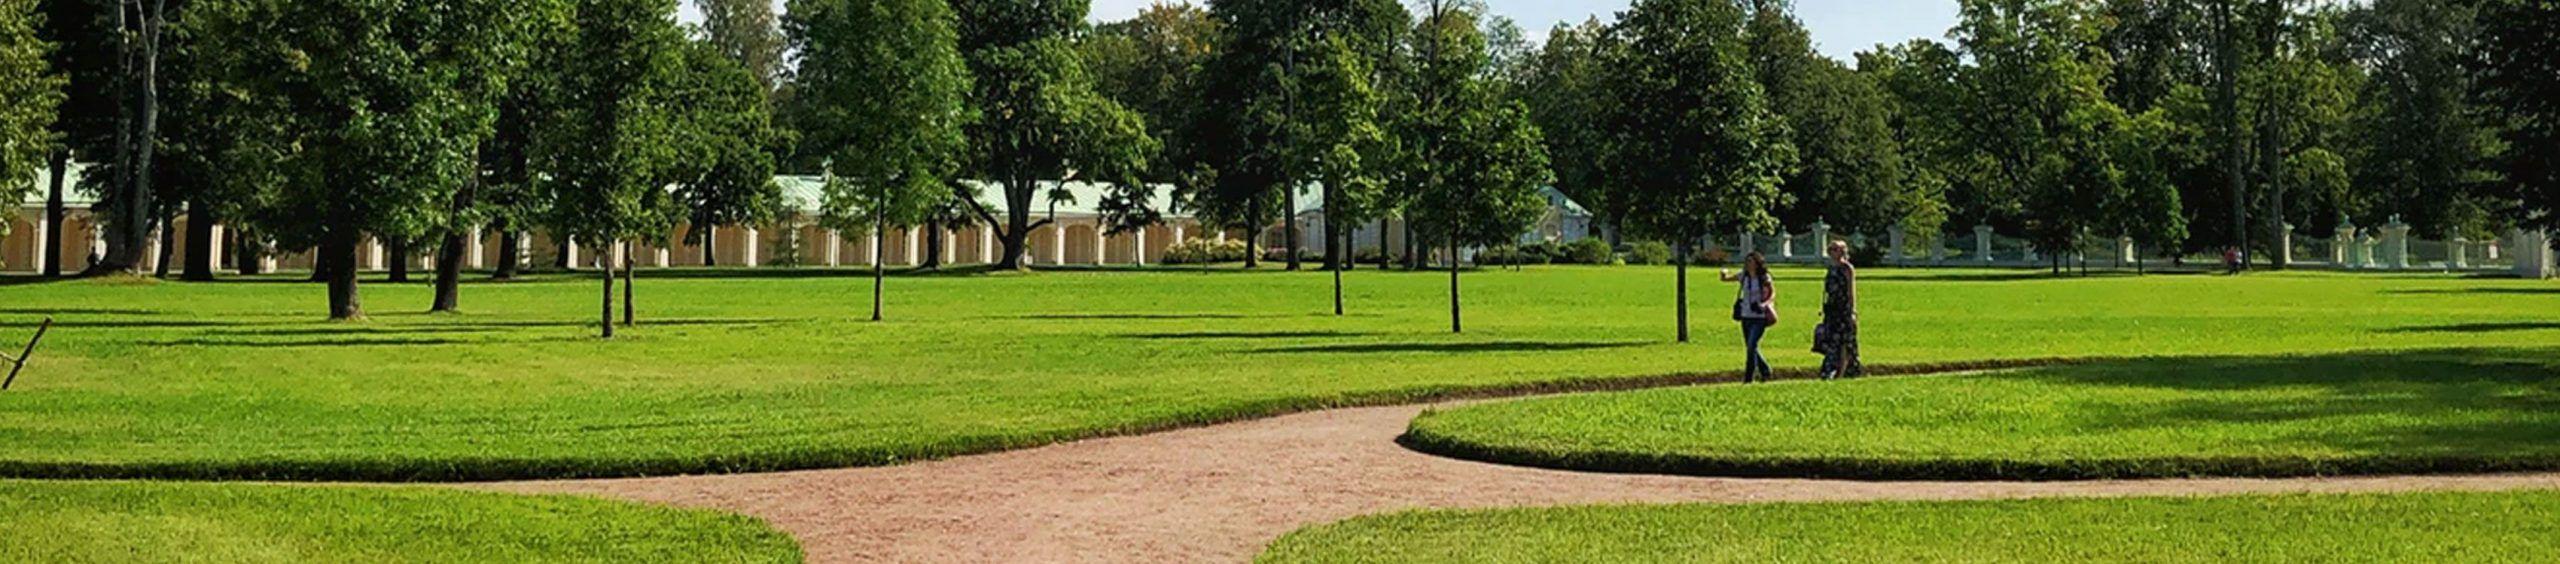 landscaper-lawns-turf-hero-background